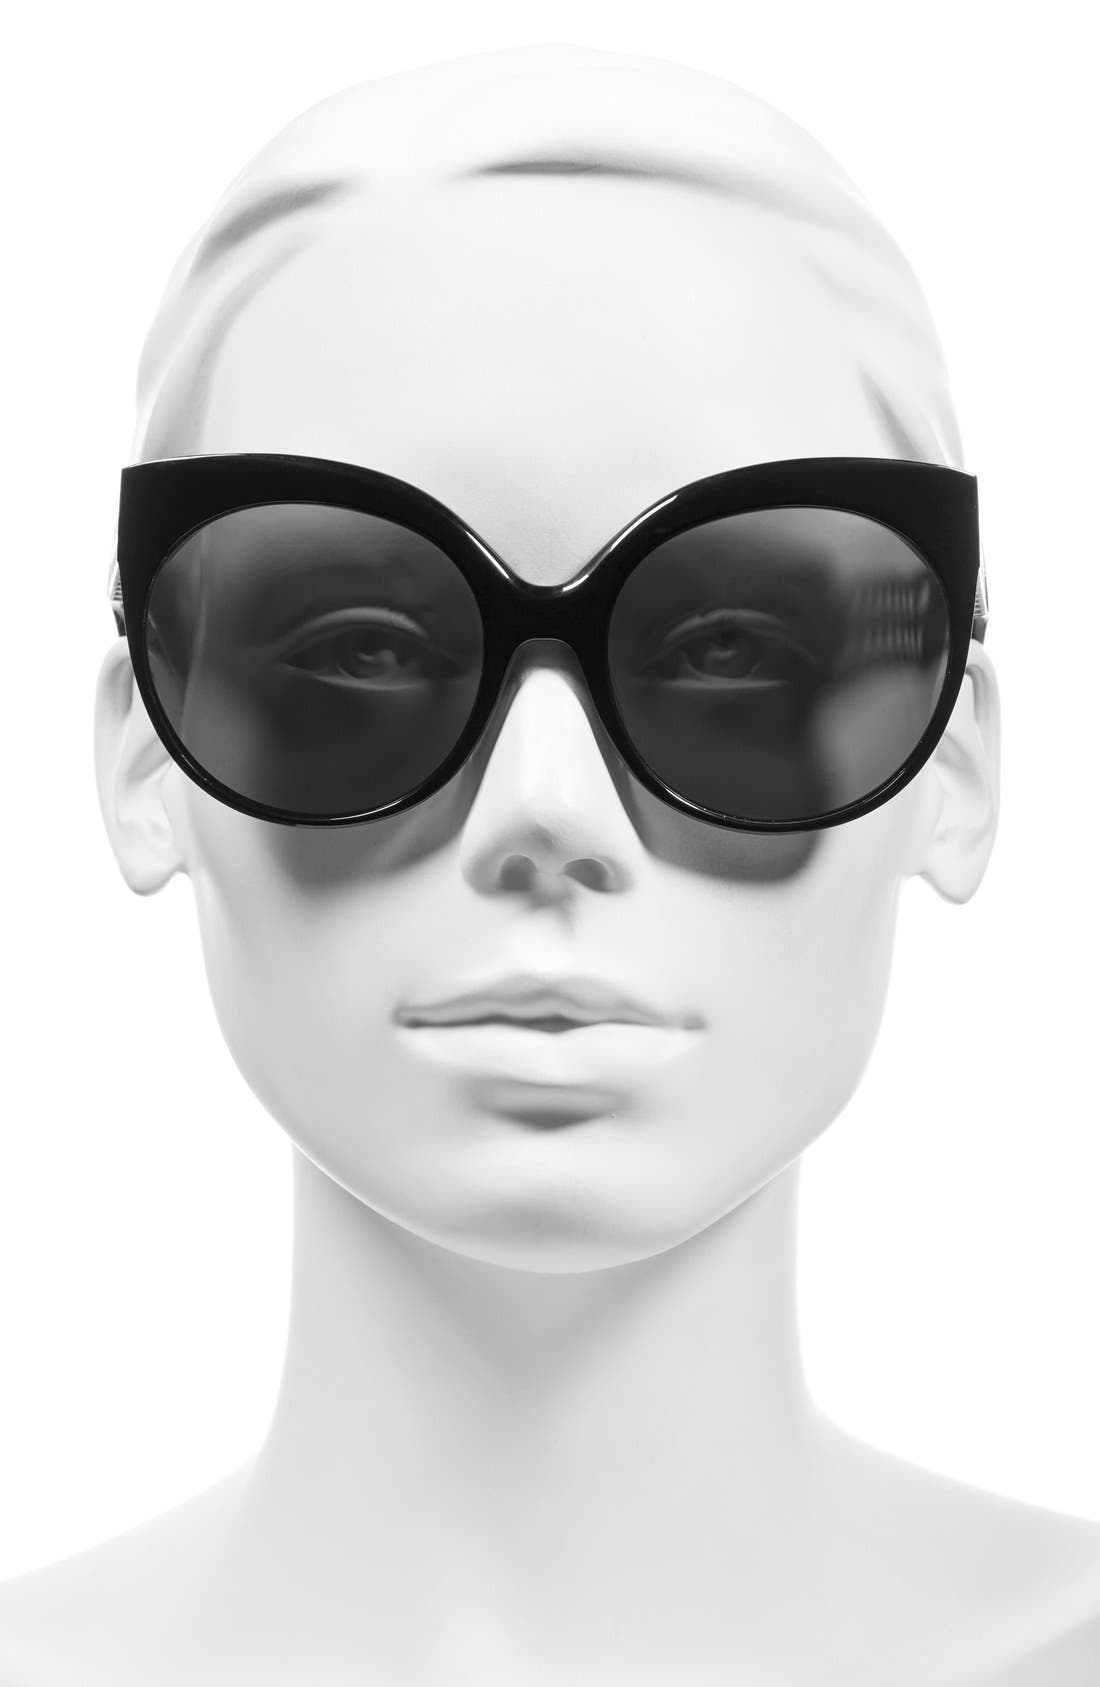 59mm Cat Eye 18 Karat White Gold Trim Sunglasses,                             Alternate thumbnail 2, color,